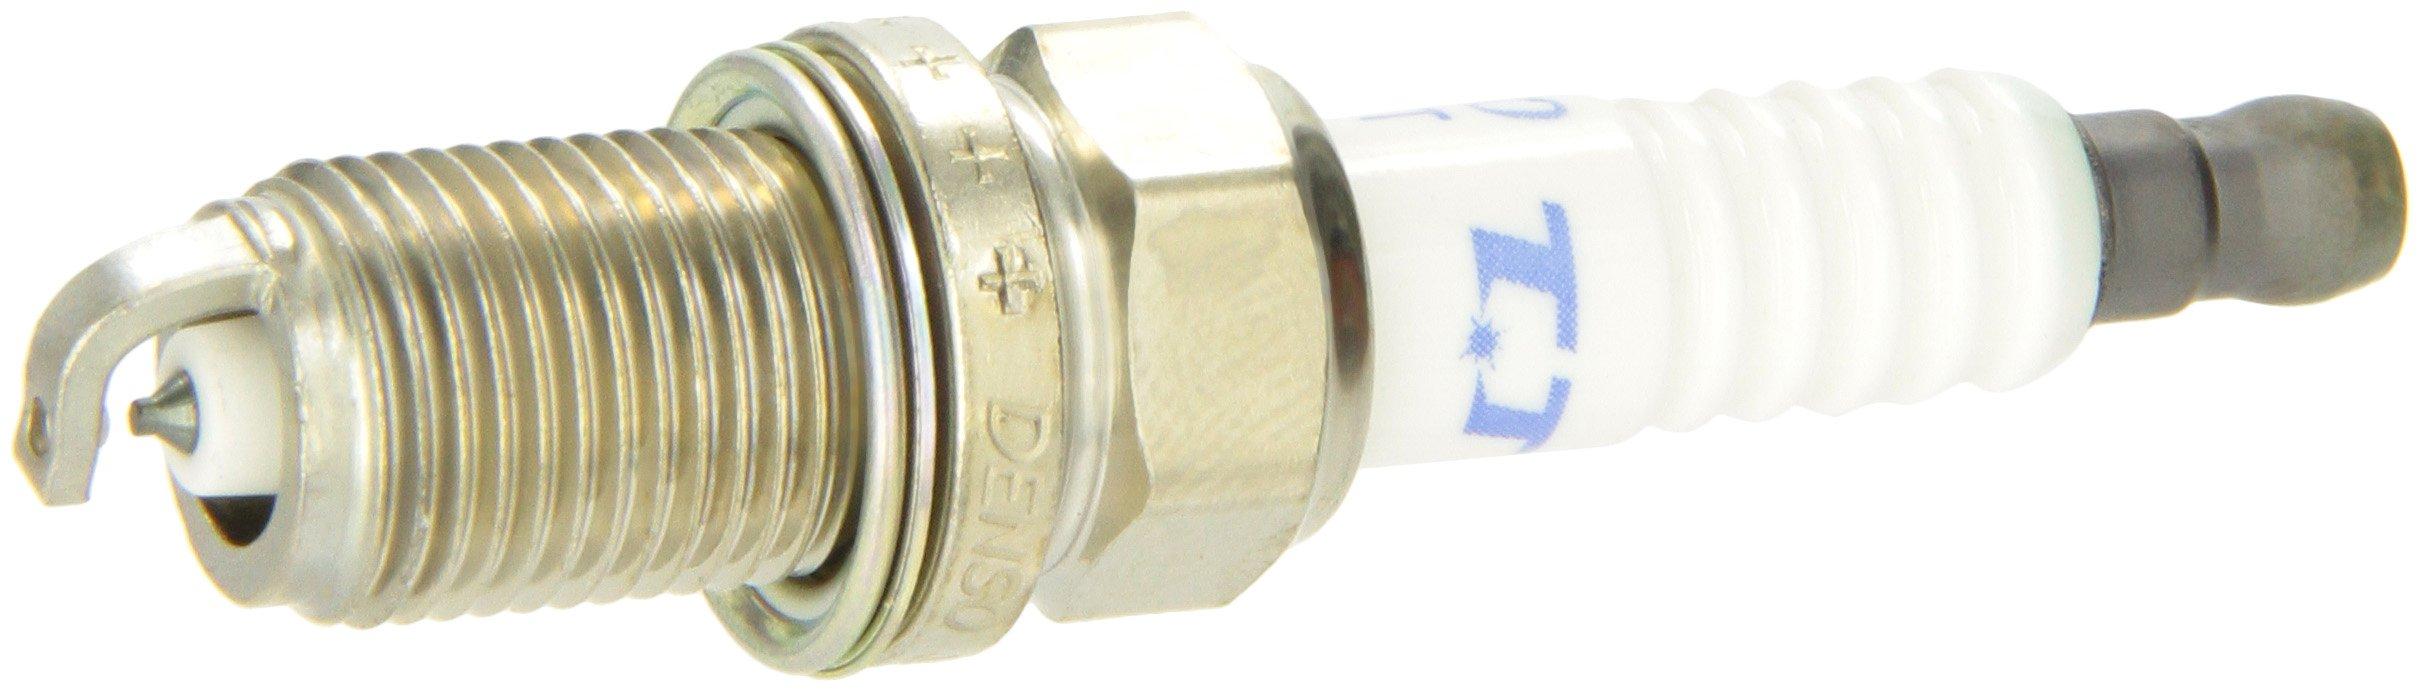 Denso (4504) PK20TT Platinum TT Spark Plug, (Pack of 1)